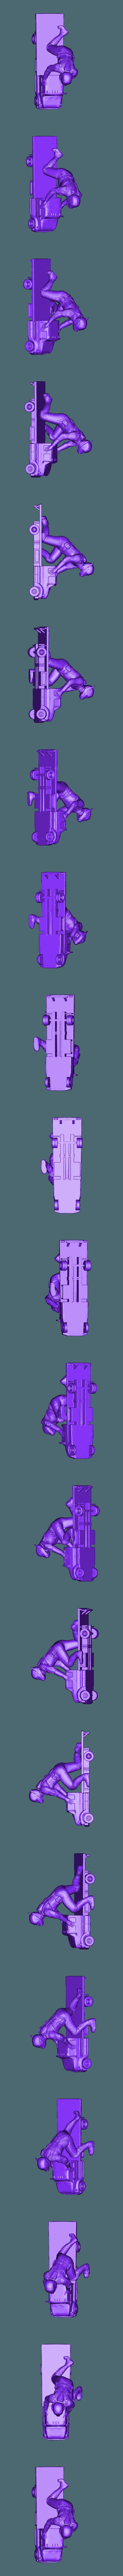 ANT-MAN-02_FULL_003.obj Download OBJ file ANT-MAN 2 INSPIRITED MODEL • 3D print template, Masterclip